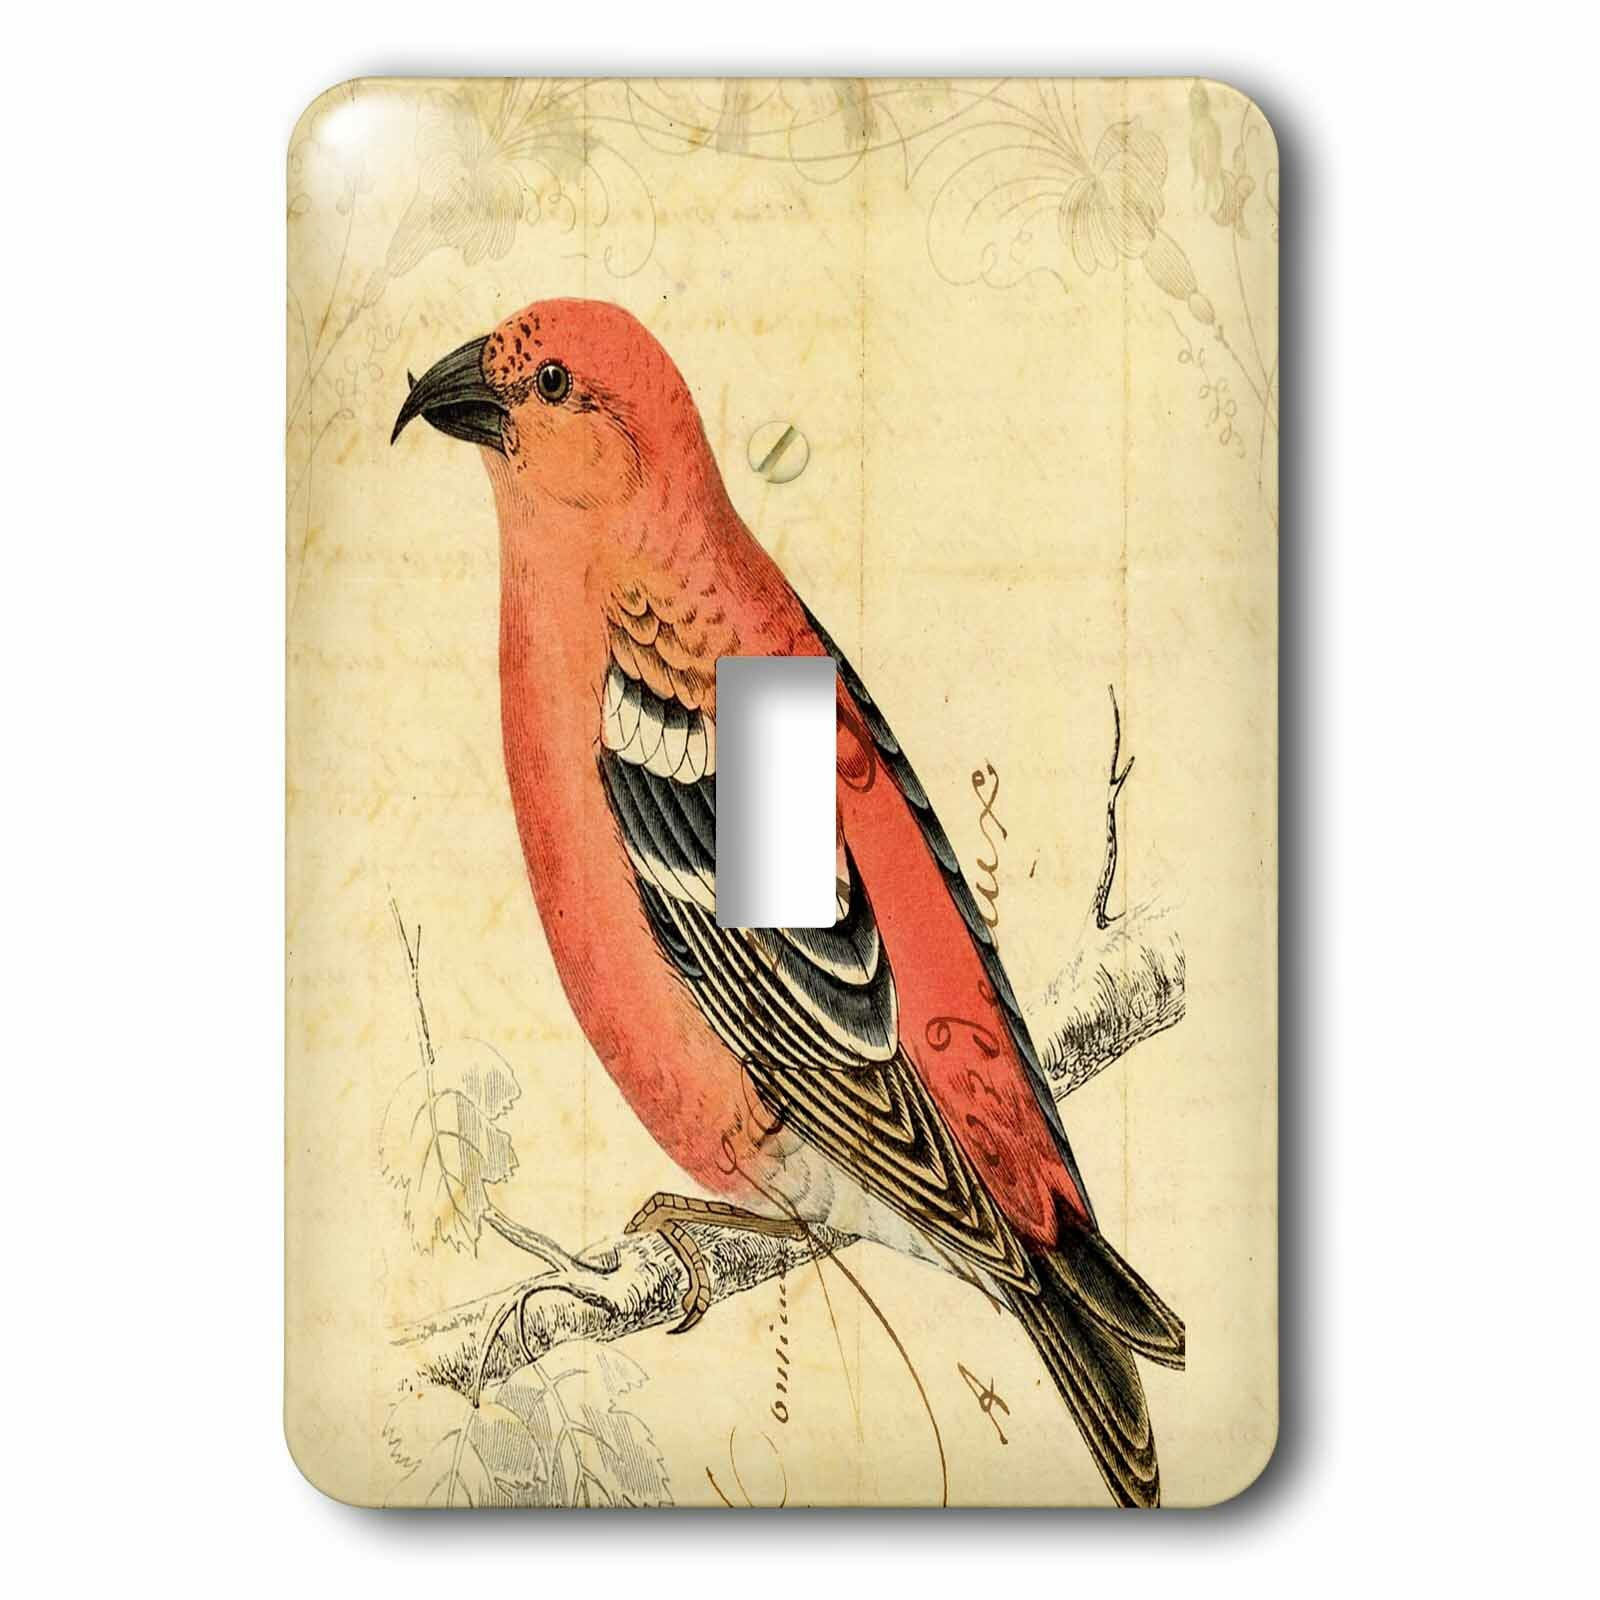 3drose Bird 1 Gang Toggle Light Switch Wall Plate Wayfair